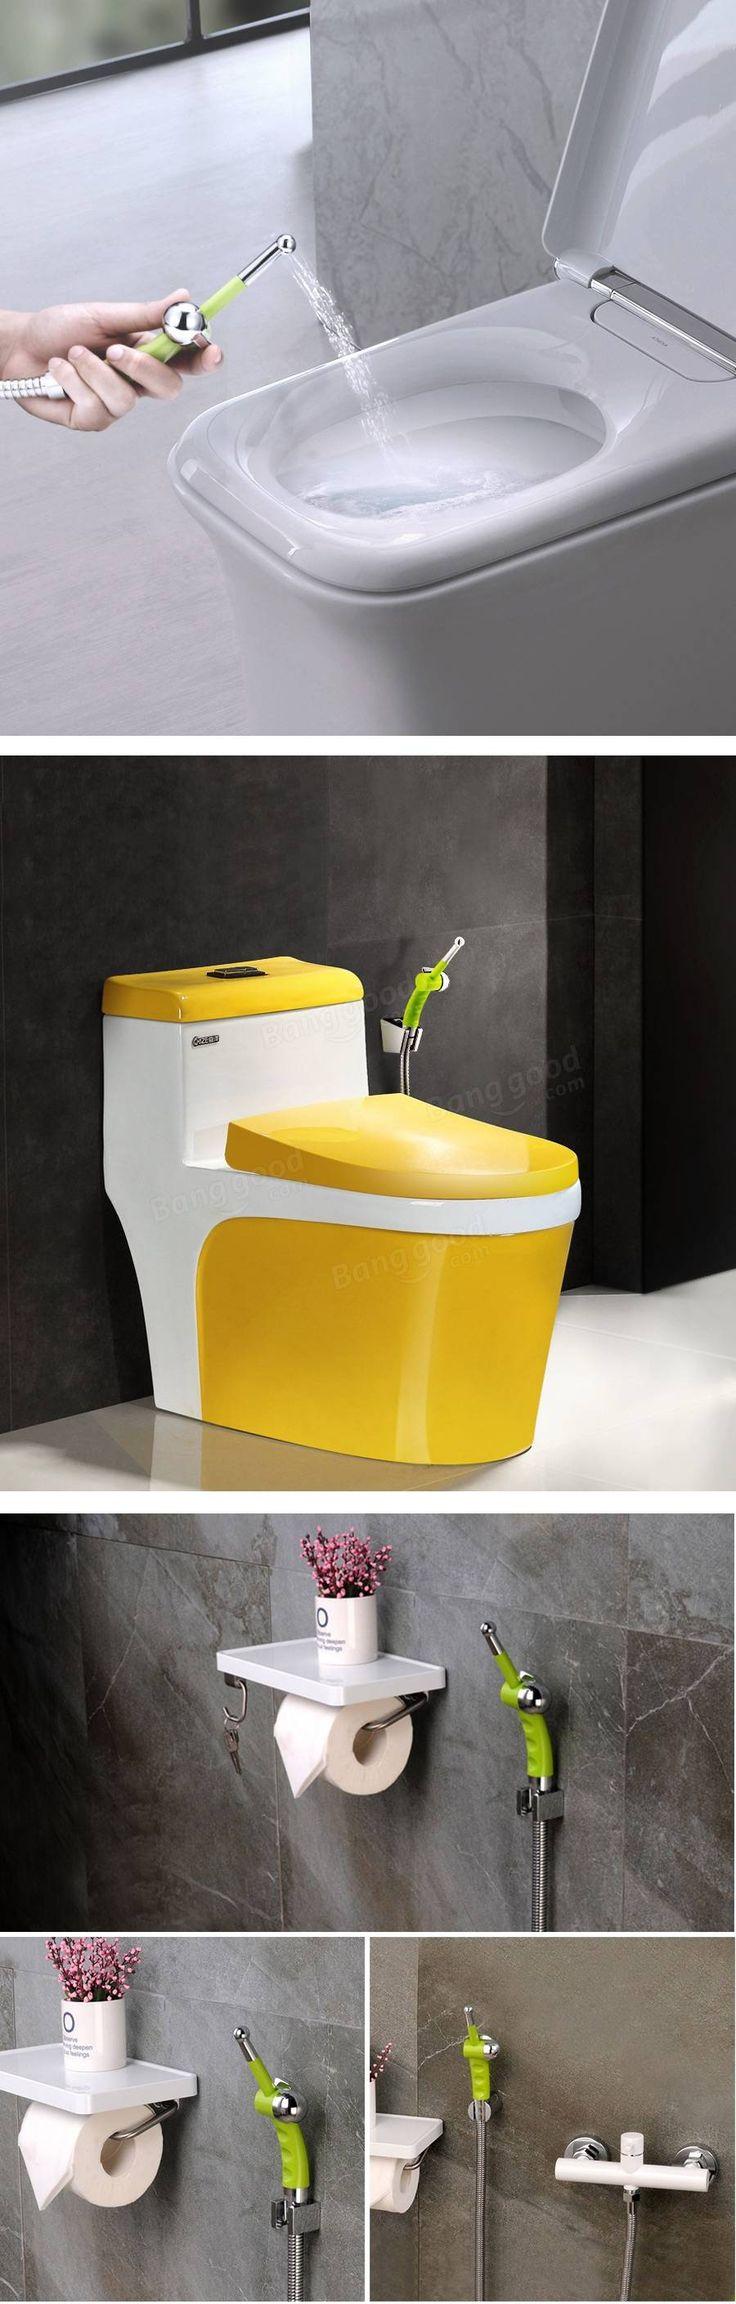 kcasa hand held bidet shower kitchen bathroom hygeian faucet toilet seat cleaning bidet sprayer